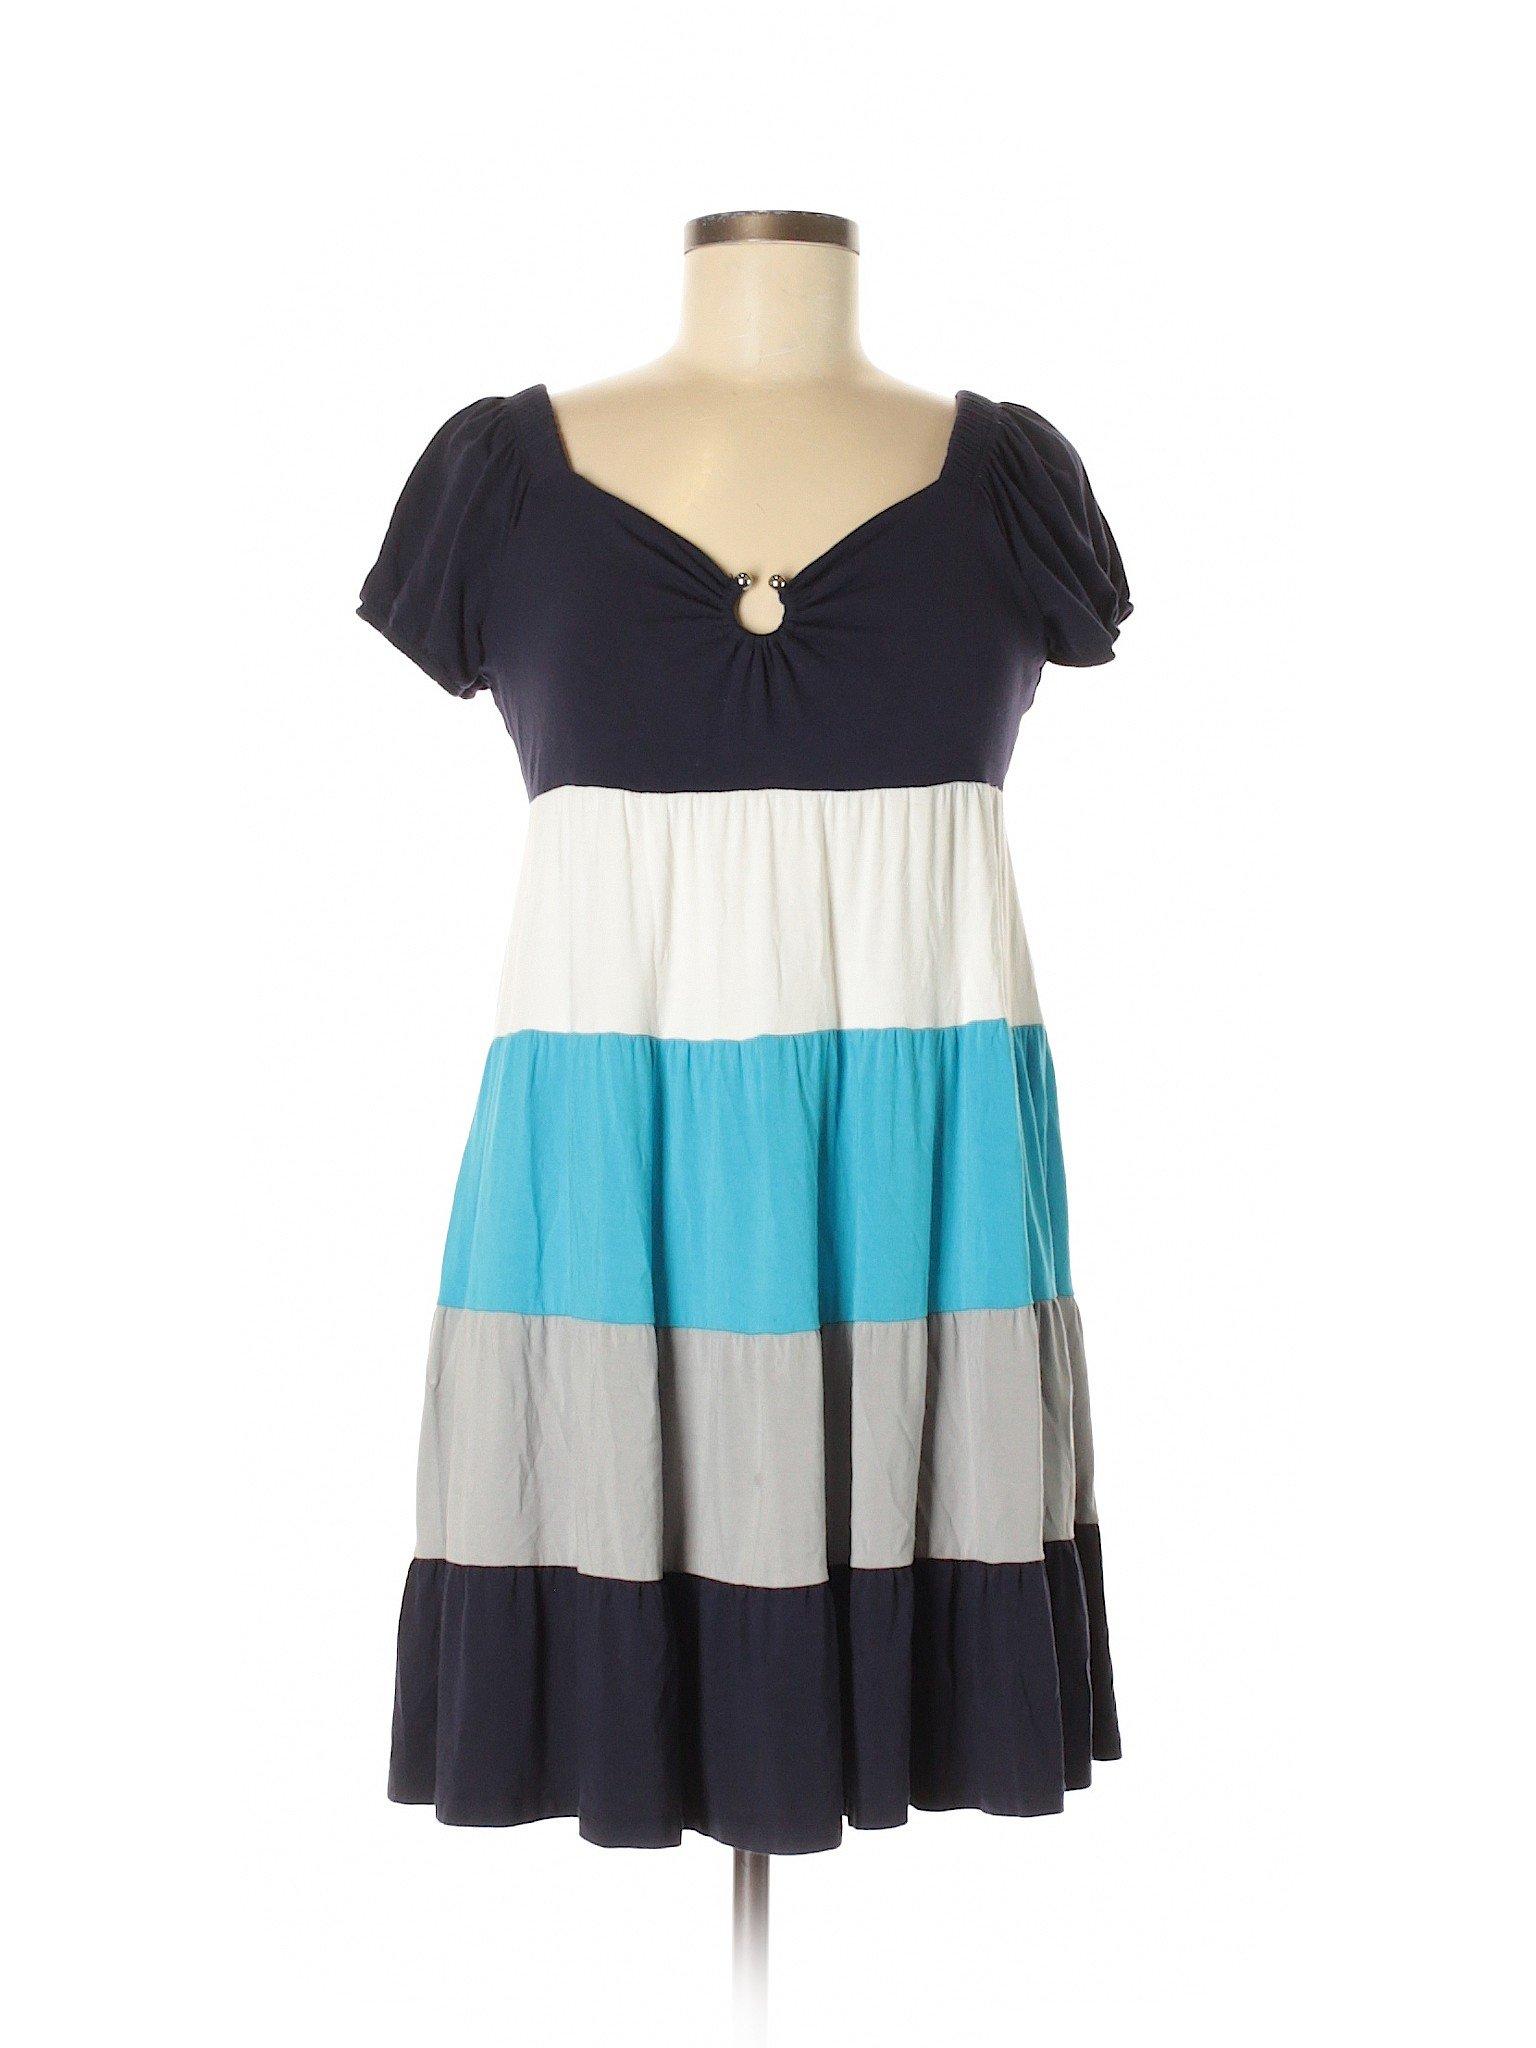 Concepts INC winter Dress Casual Boutique International 5nt8dxz5U